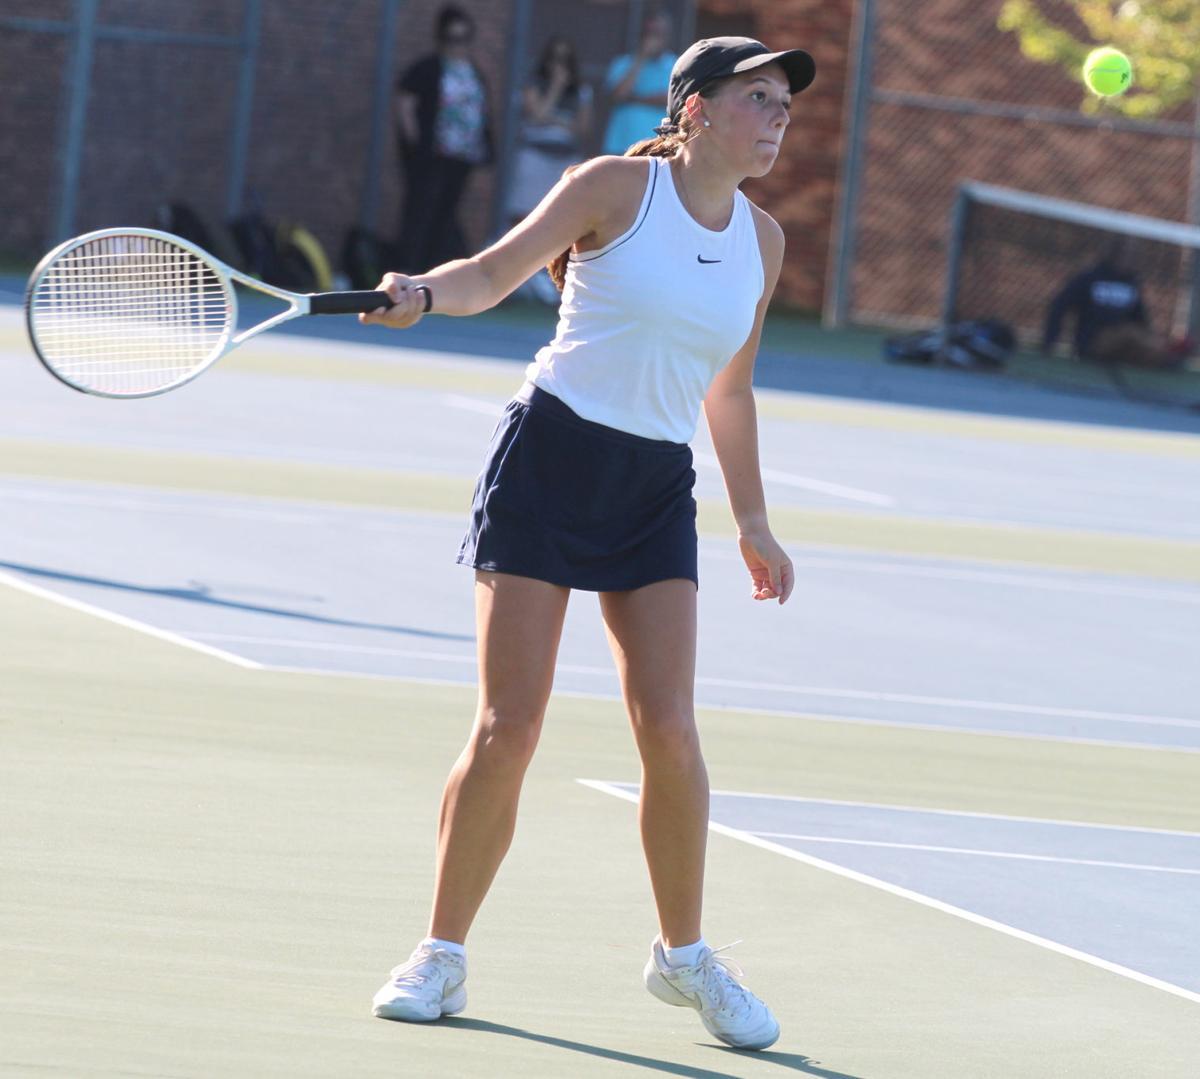 Chan Tennis - Gerding